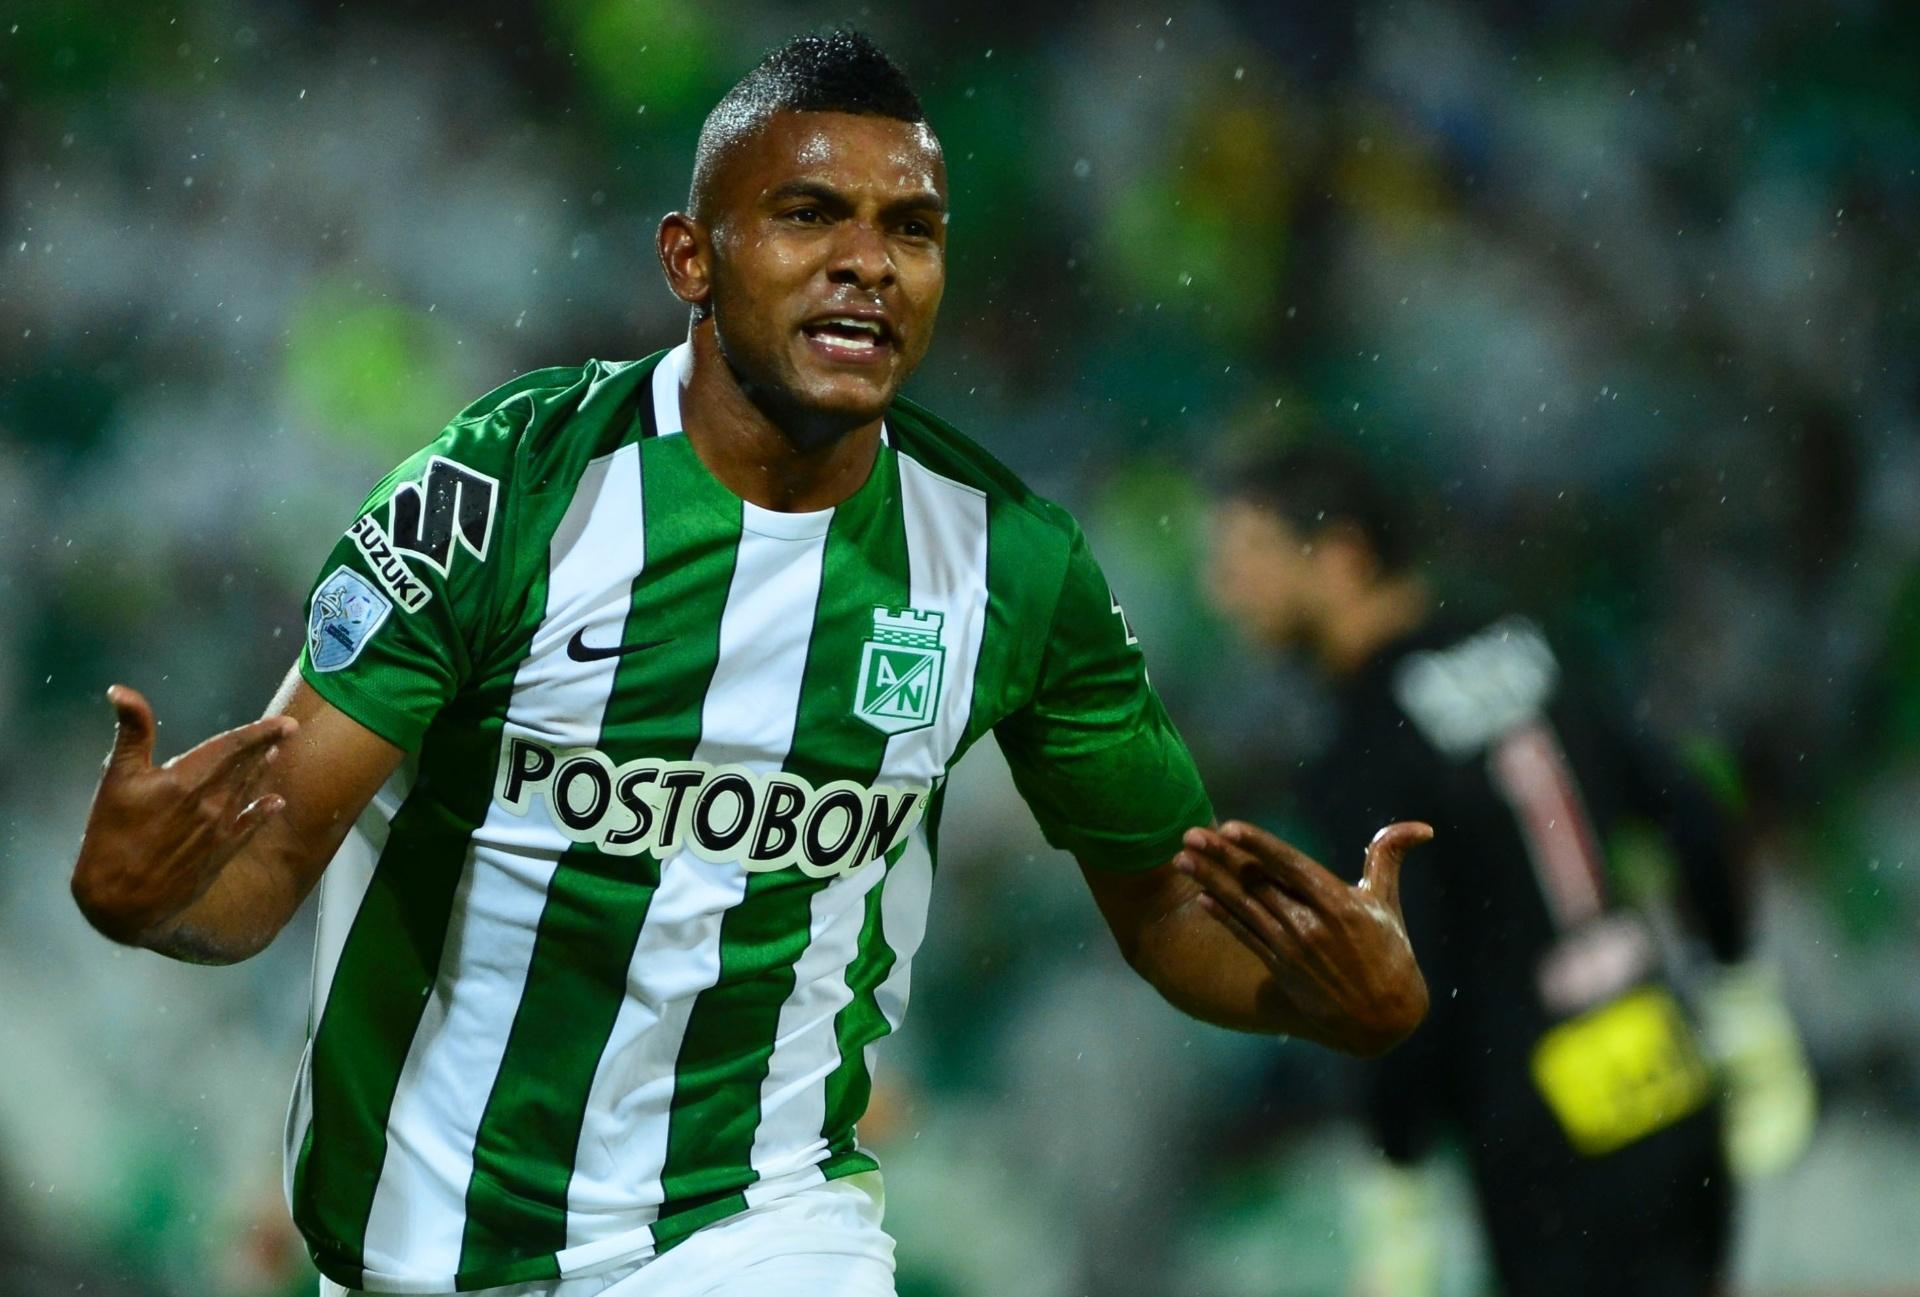 miguel-borja-comemora-o-gol-do-atletico-nacional-sobre-o-sao-paulo-1468459277340_1920x1297